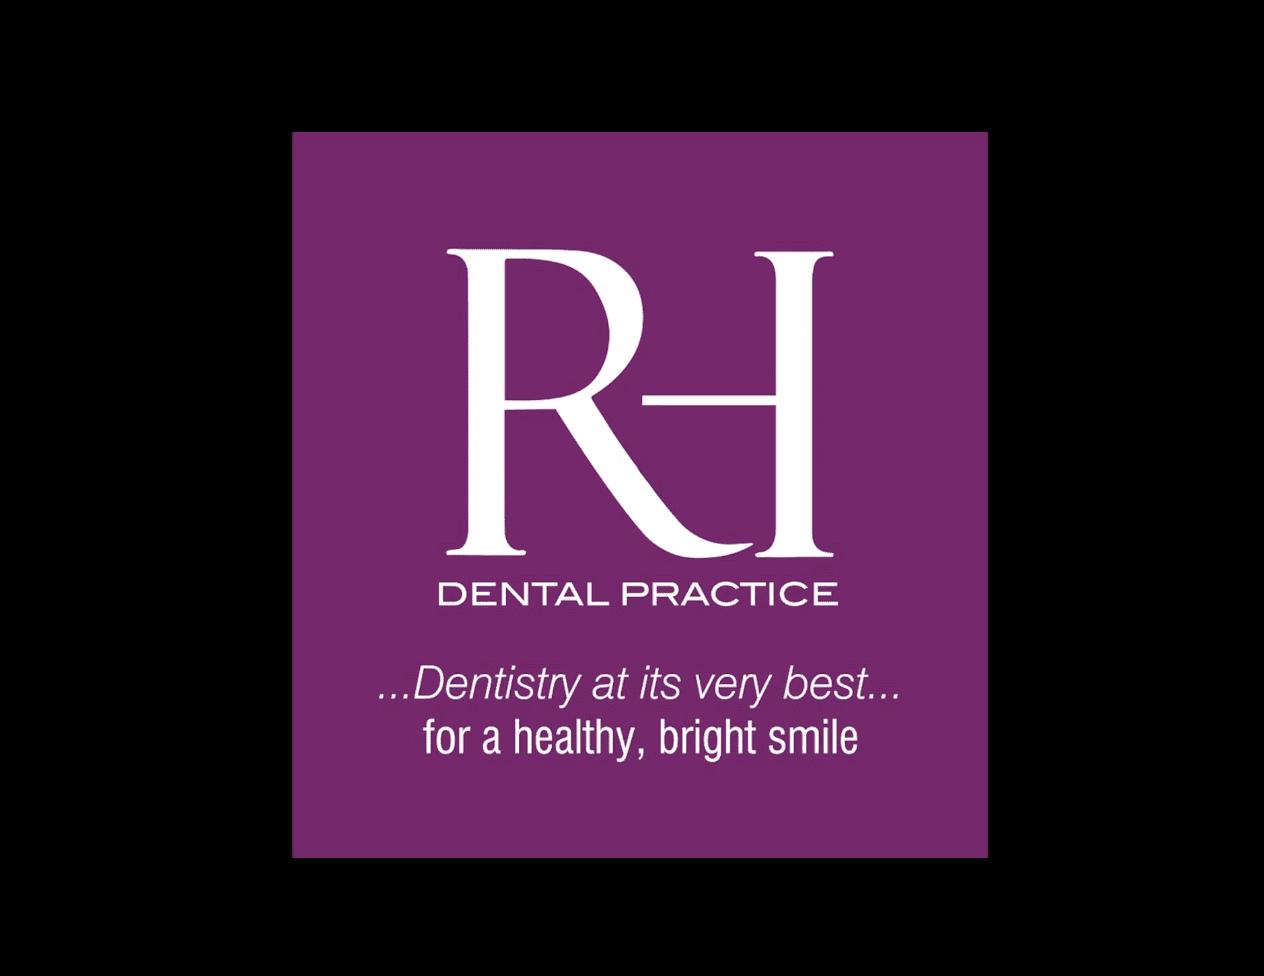 Rock House Dental Practice Logo for Video Overlay